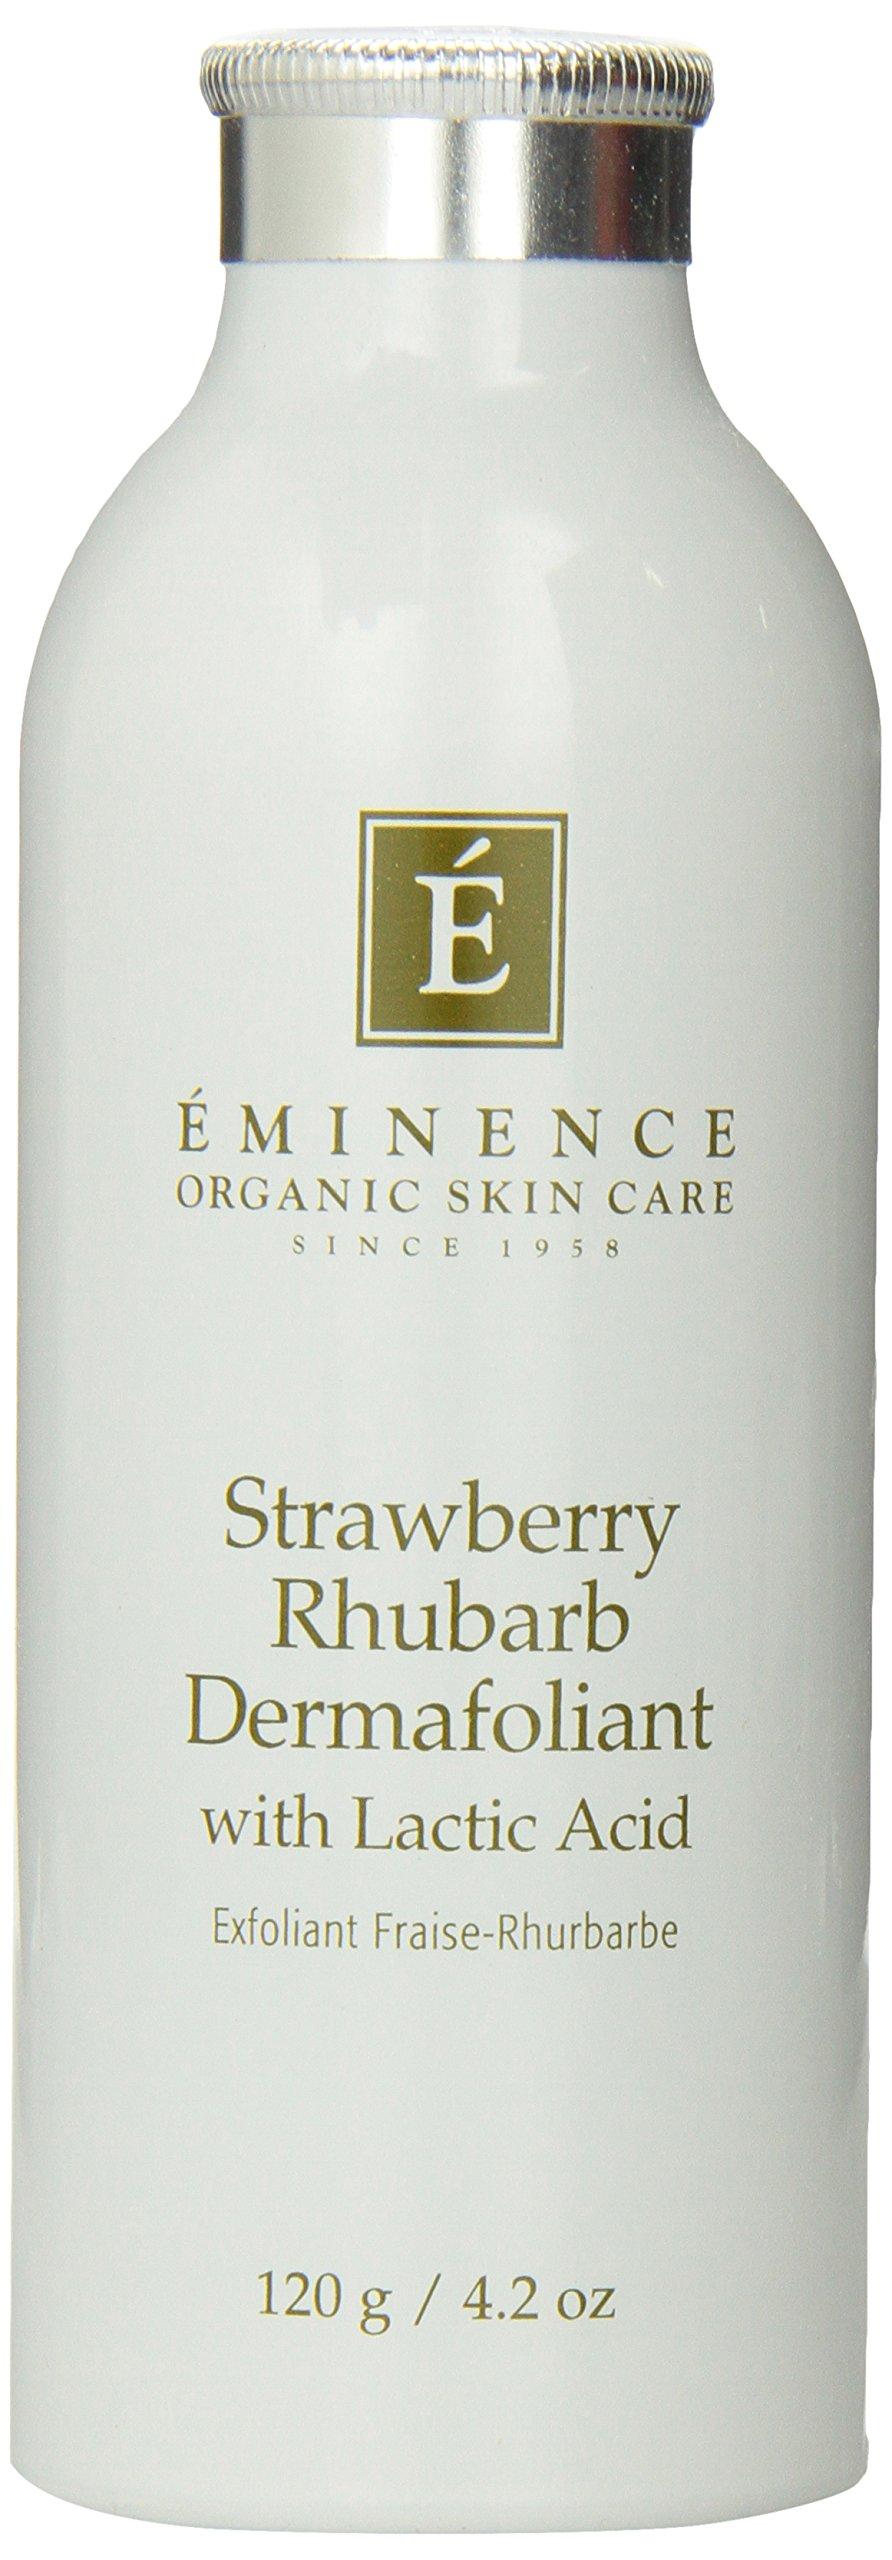 Eminence Strawberry Rhubarb Dermafoliant, 4.2 Ounce by Eminence Organic Skincare